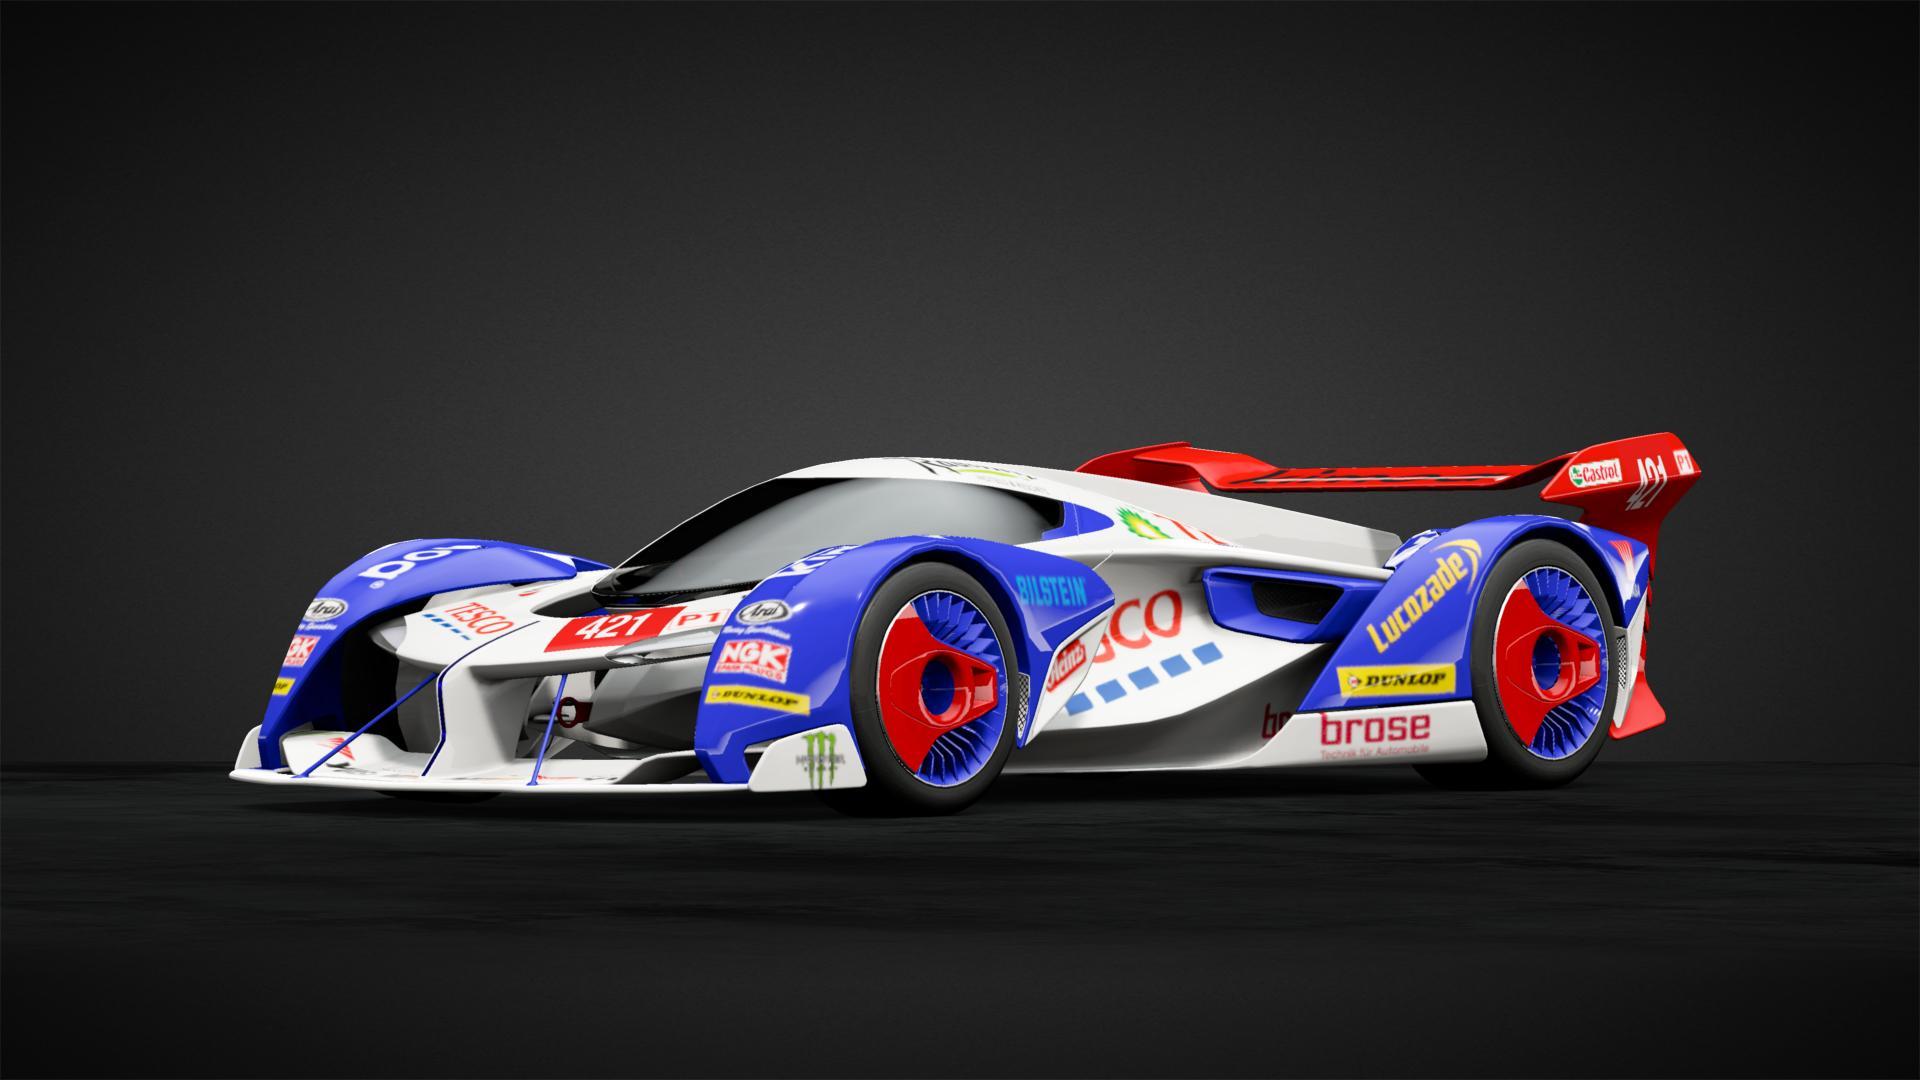 703250ca38a9 Project 21 team tesco ngr l24 - Car Livery by darkkarter421 | Community |  Gran Turismo Sport